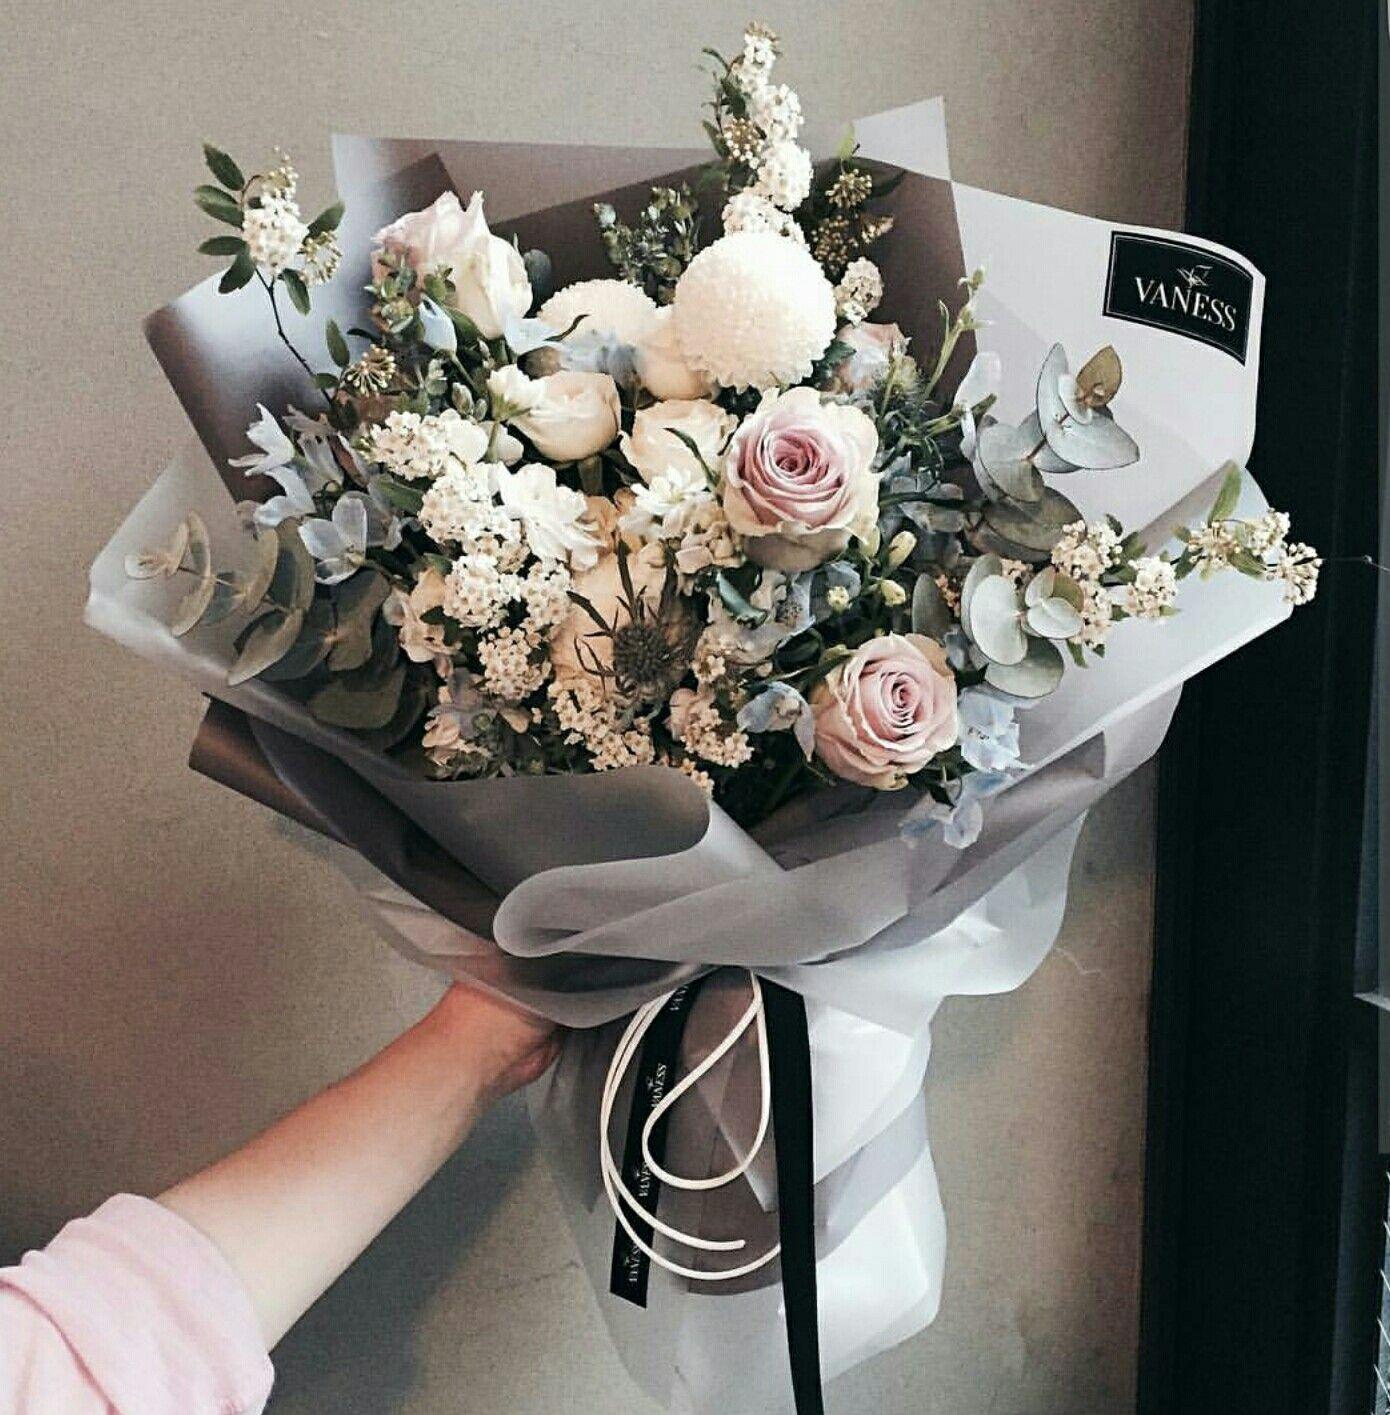 Pin oleh aak florist di TOKO BUNGA BEKASI Bunga peony